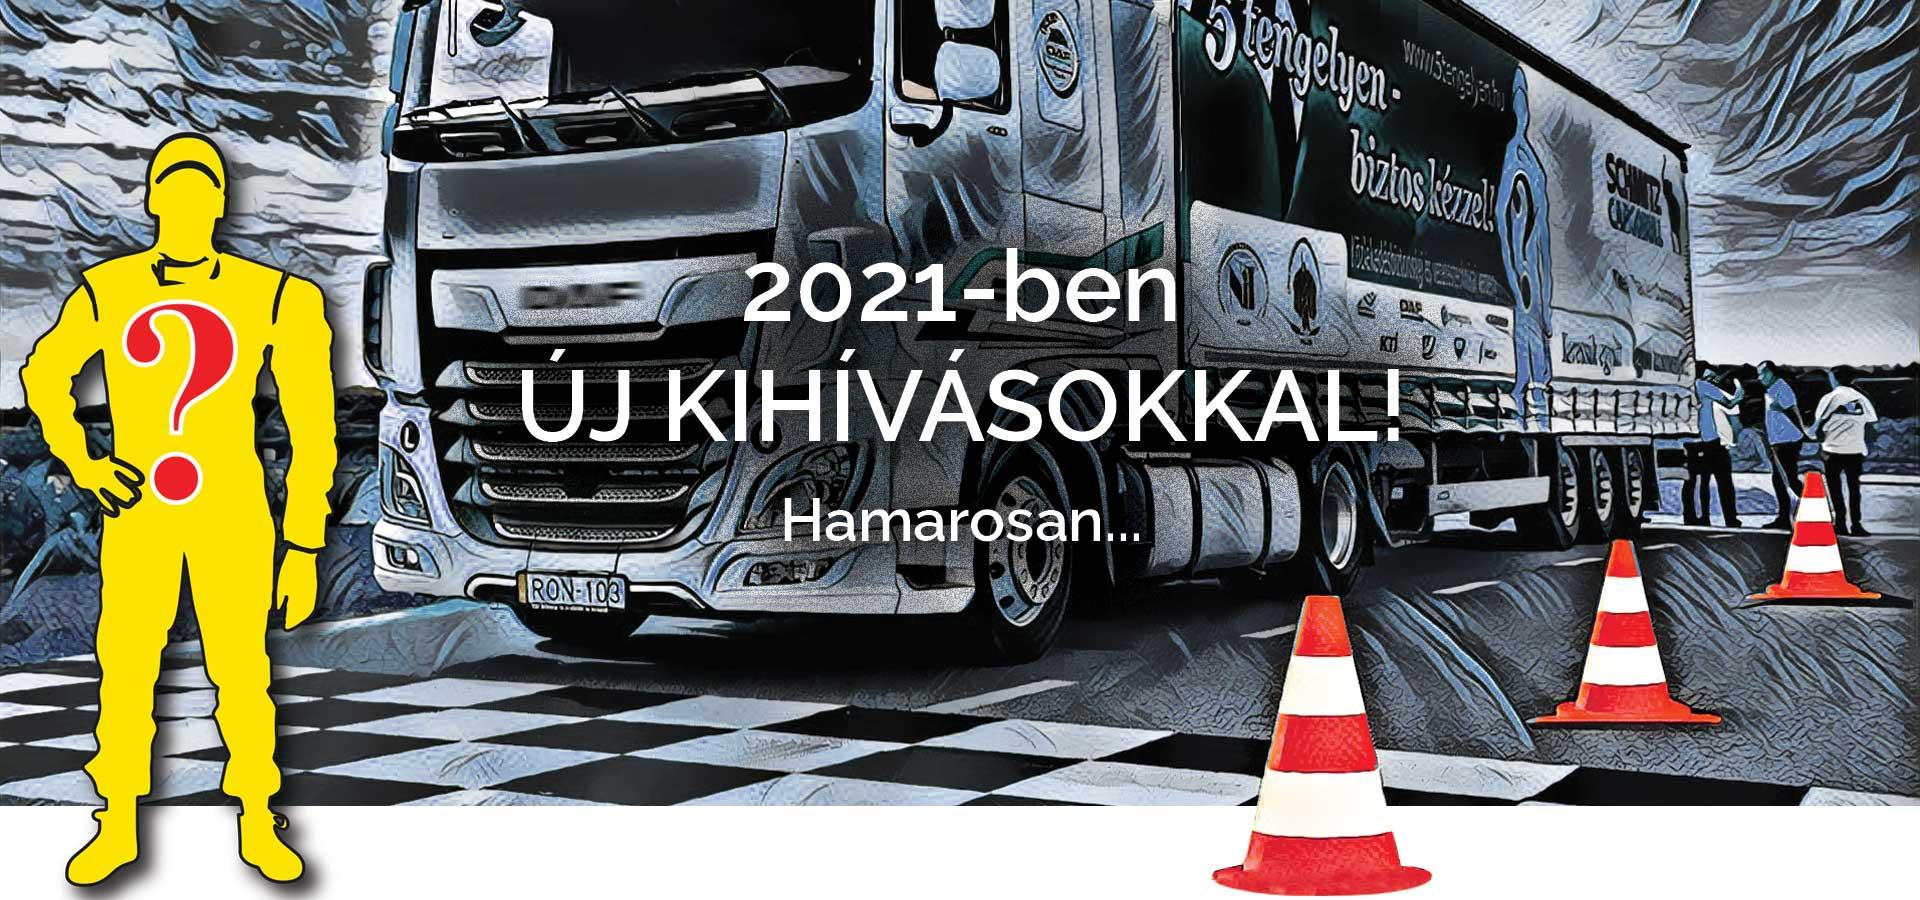 5 tengelyen rajzos kamion 2021